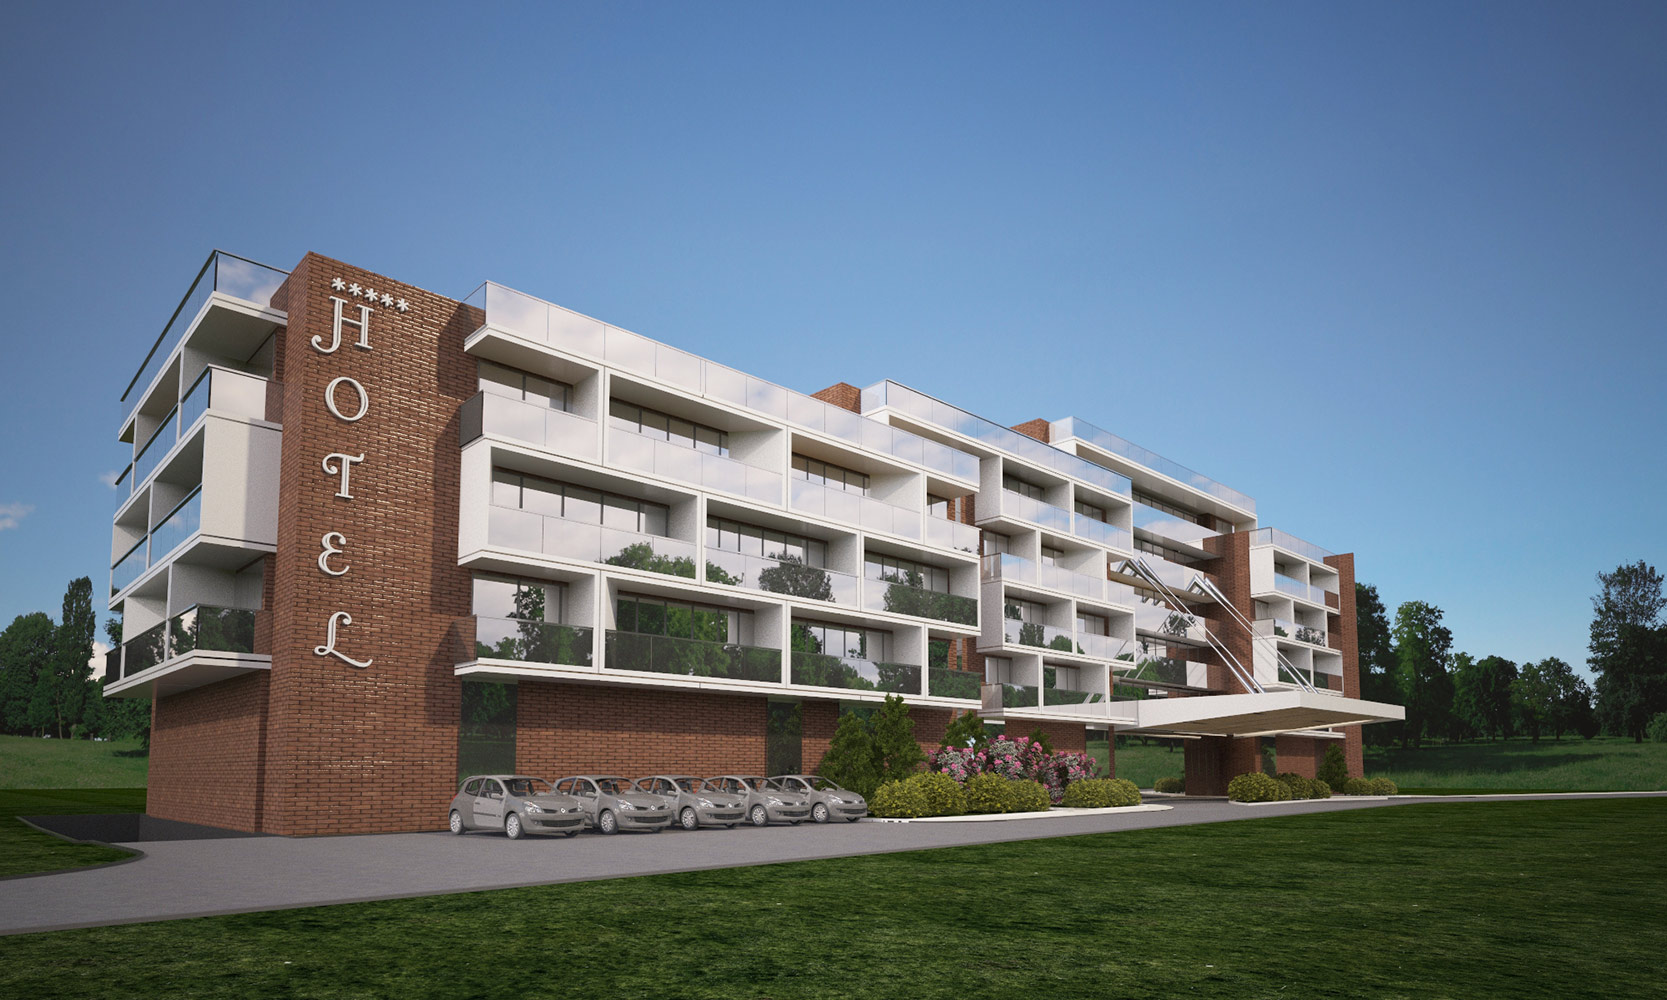 2015 Hotel Hisarya - Brick Exterior